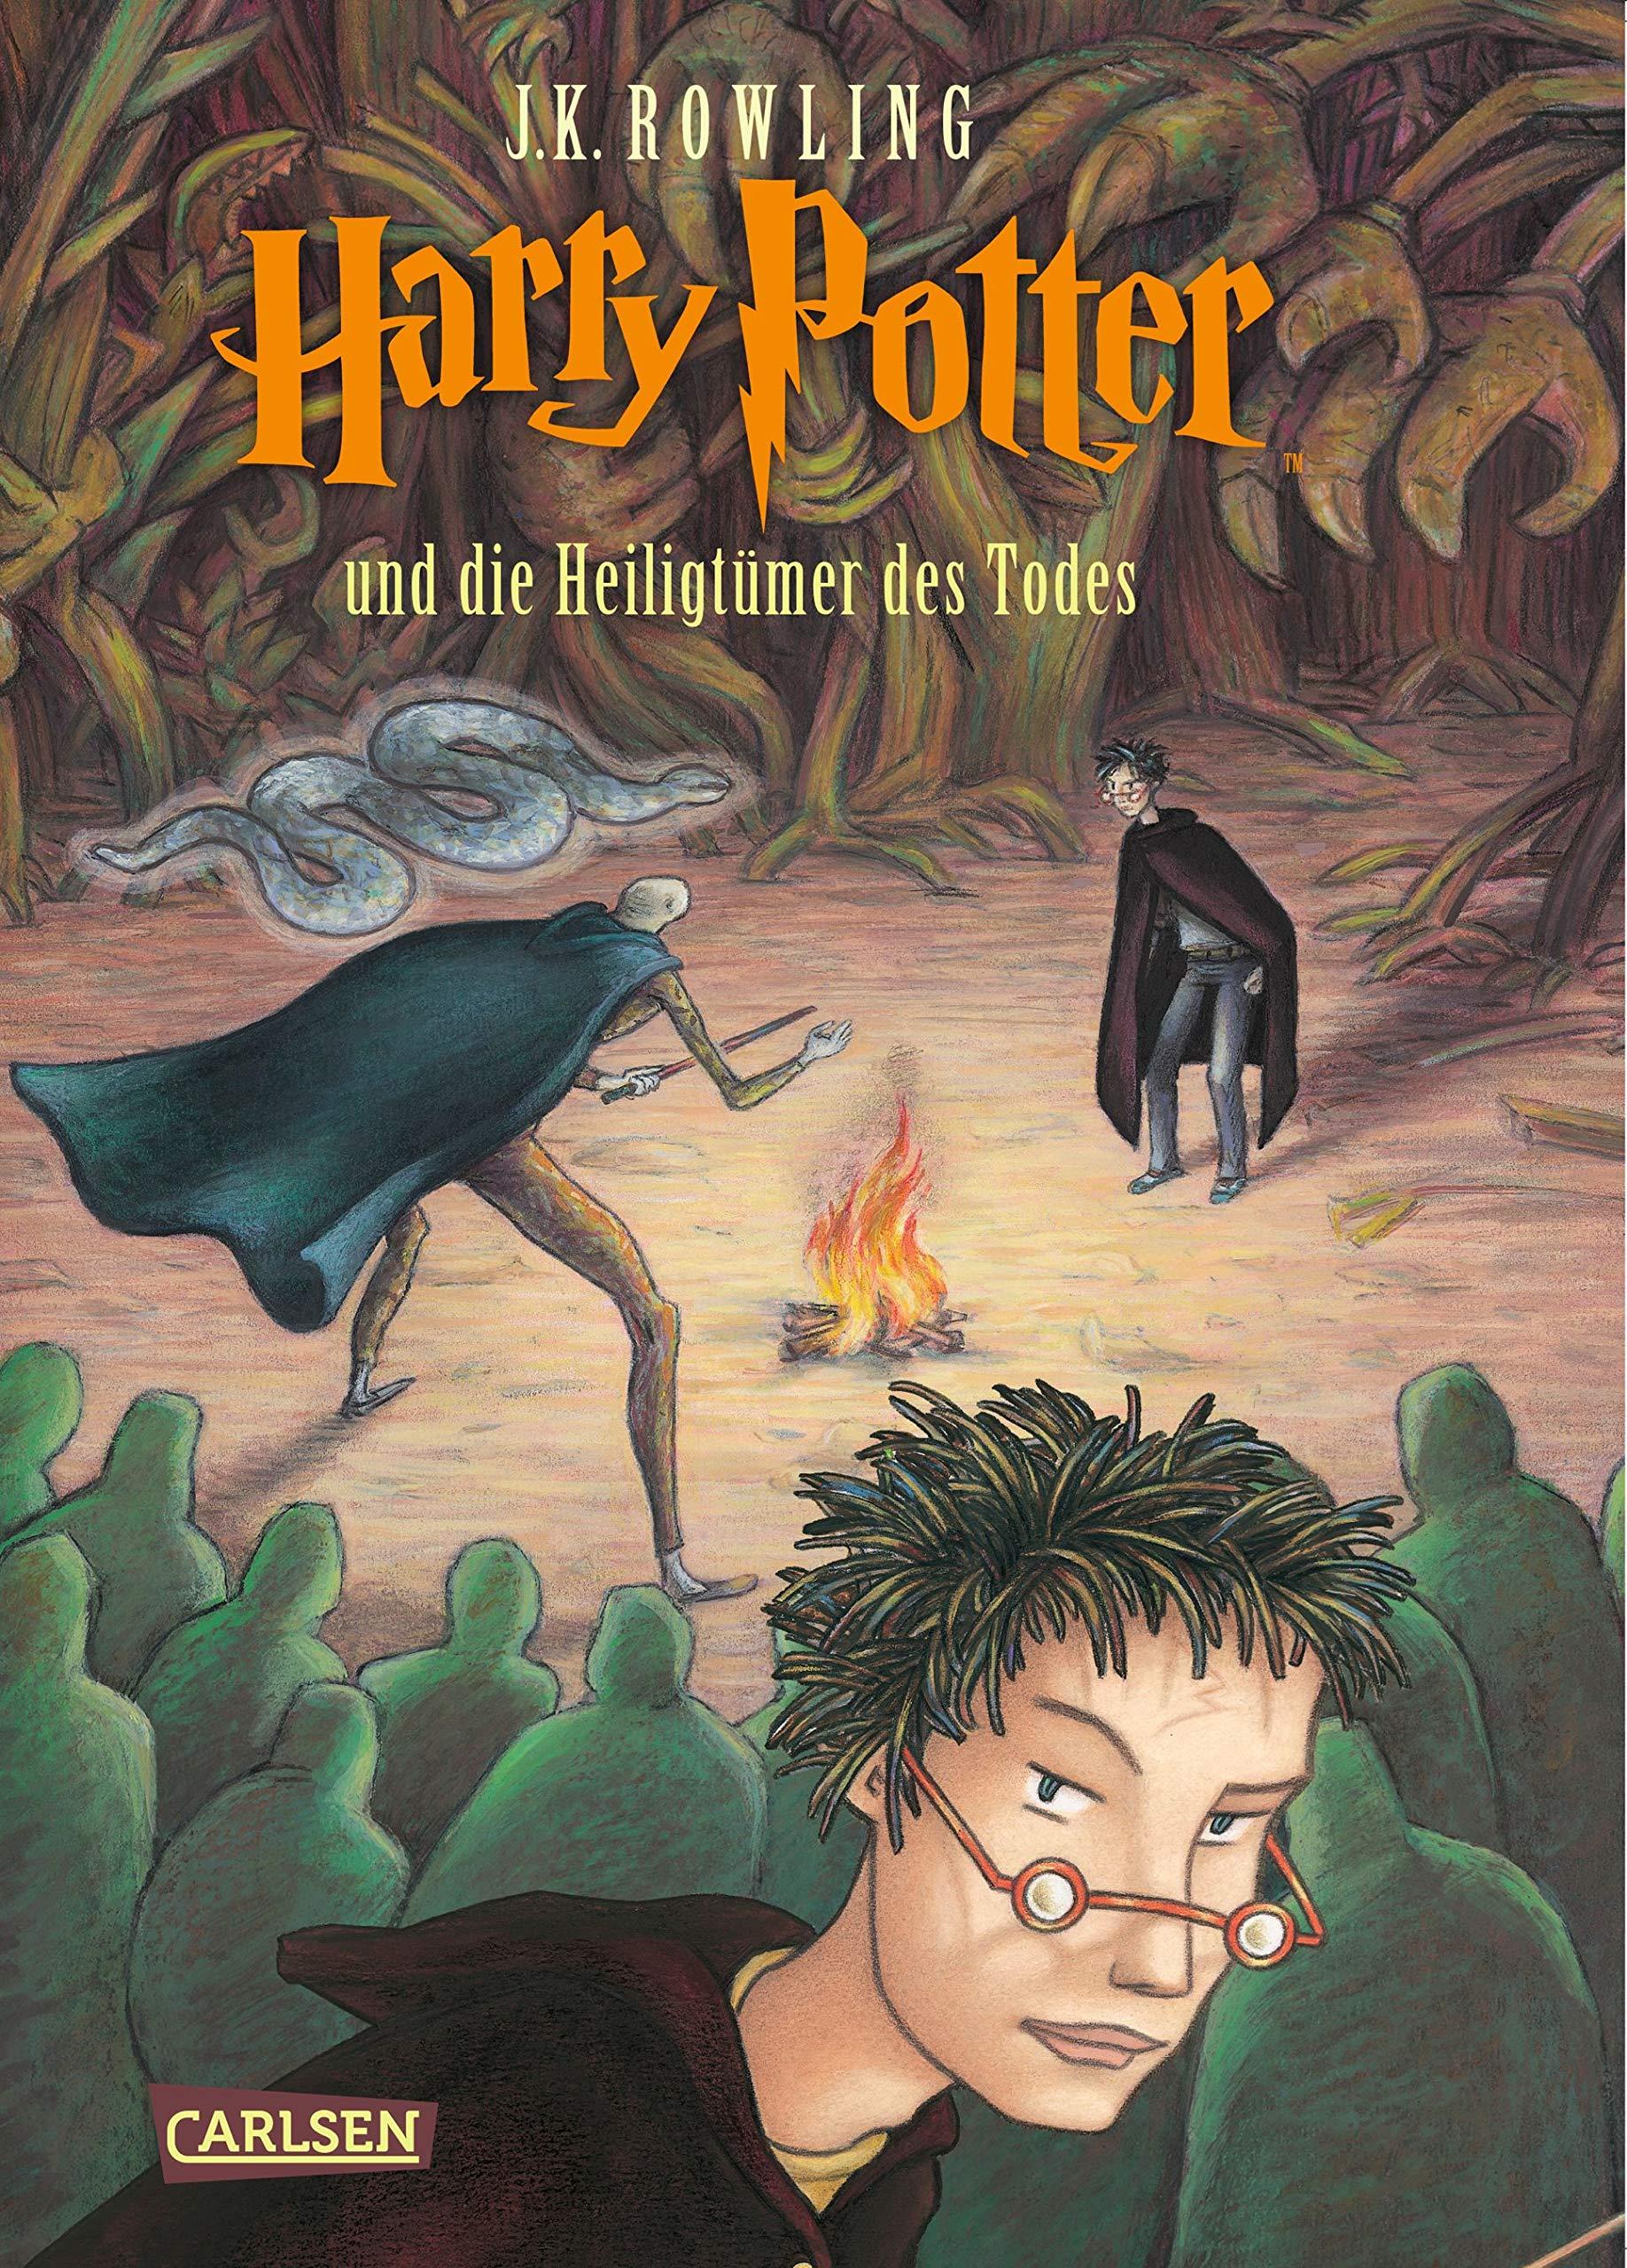 Harry Potter 7 Td German Edition J K Rowling 9783551577771 Amazon Com Books